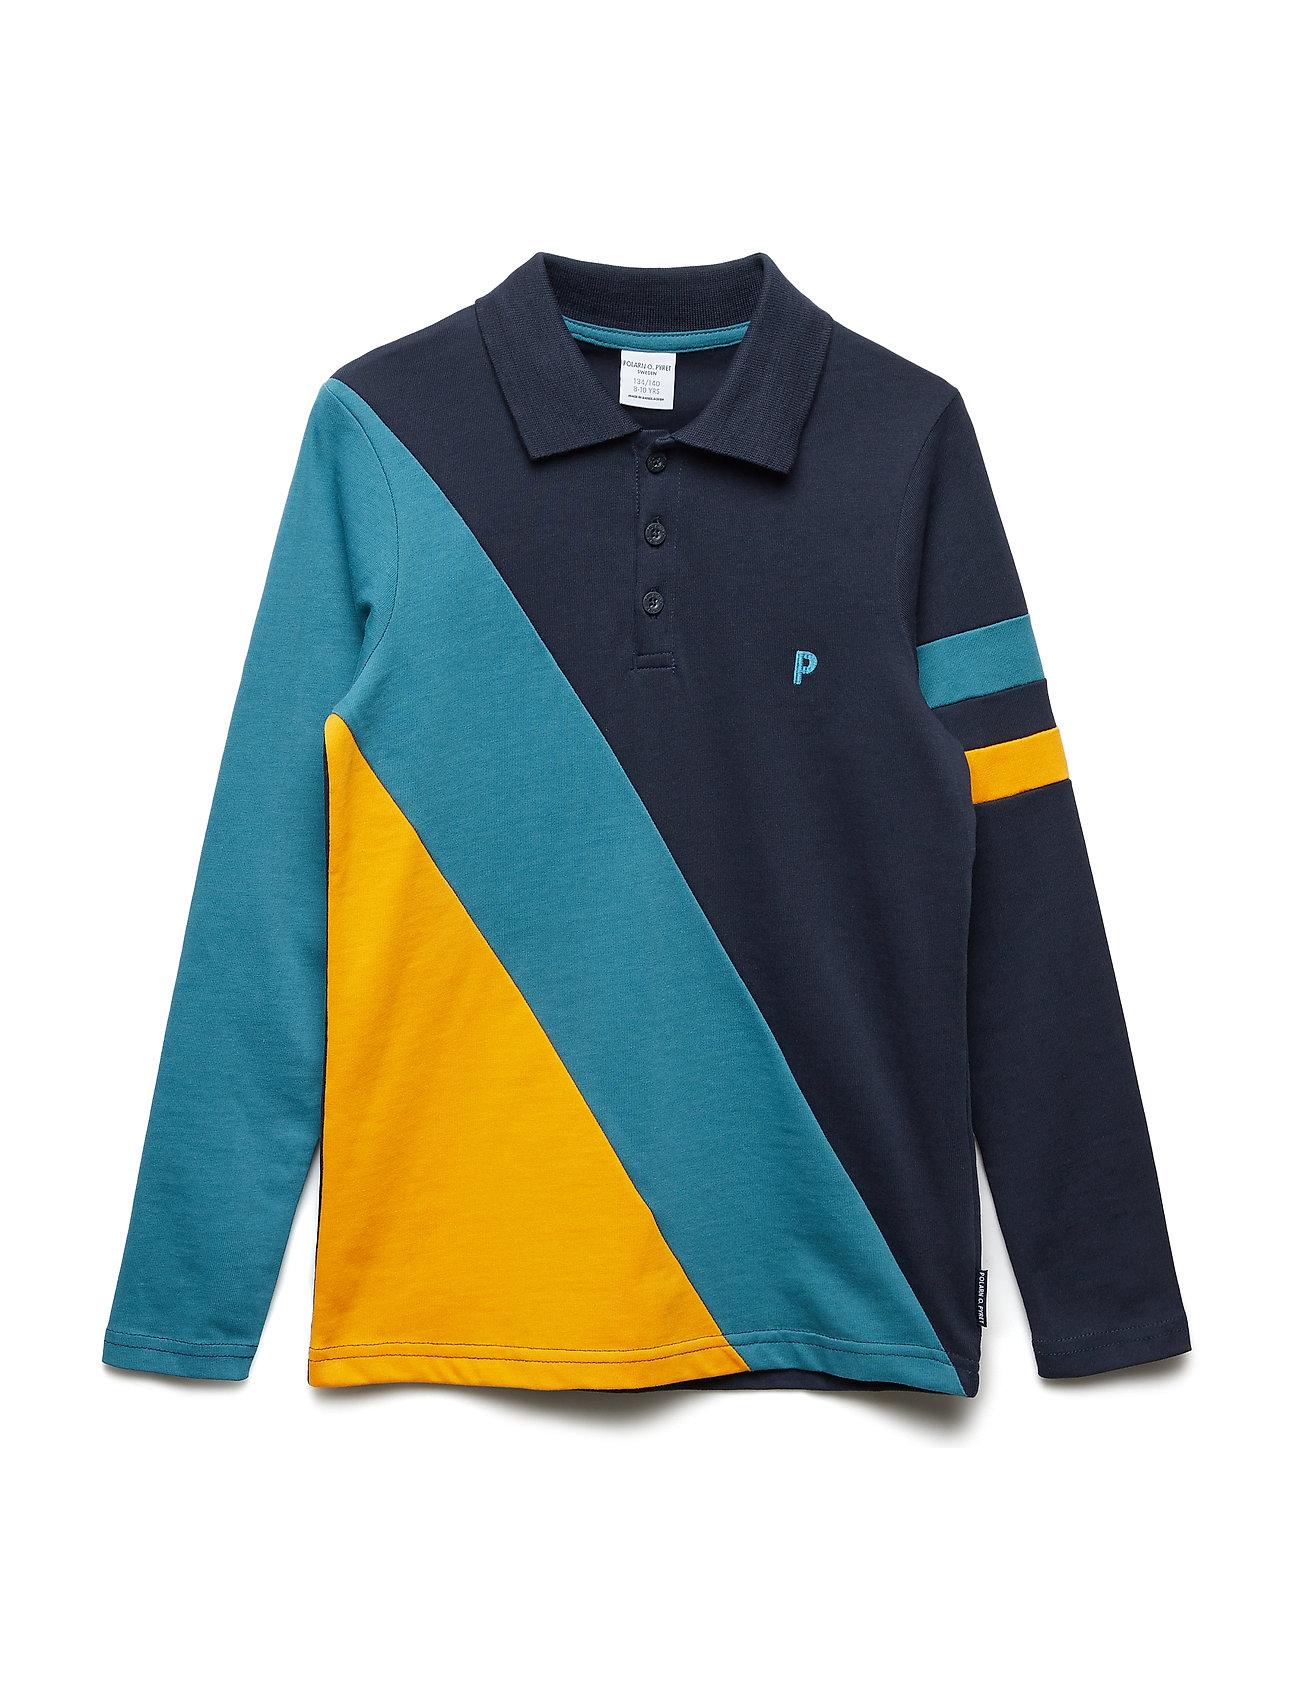 Polarn O. Pyret Top Long Sleeve with collar School